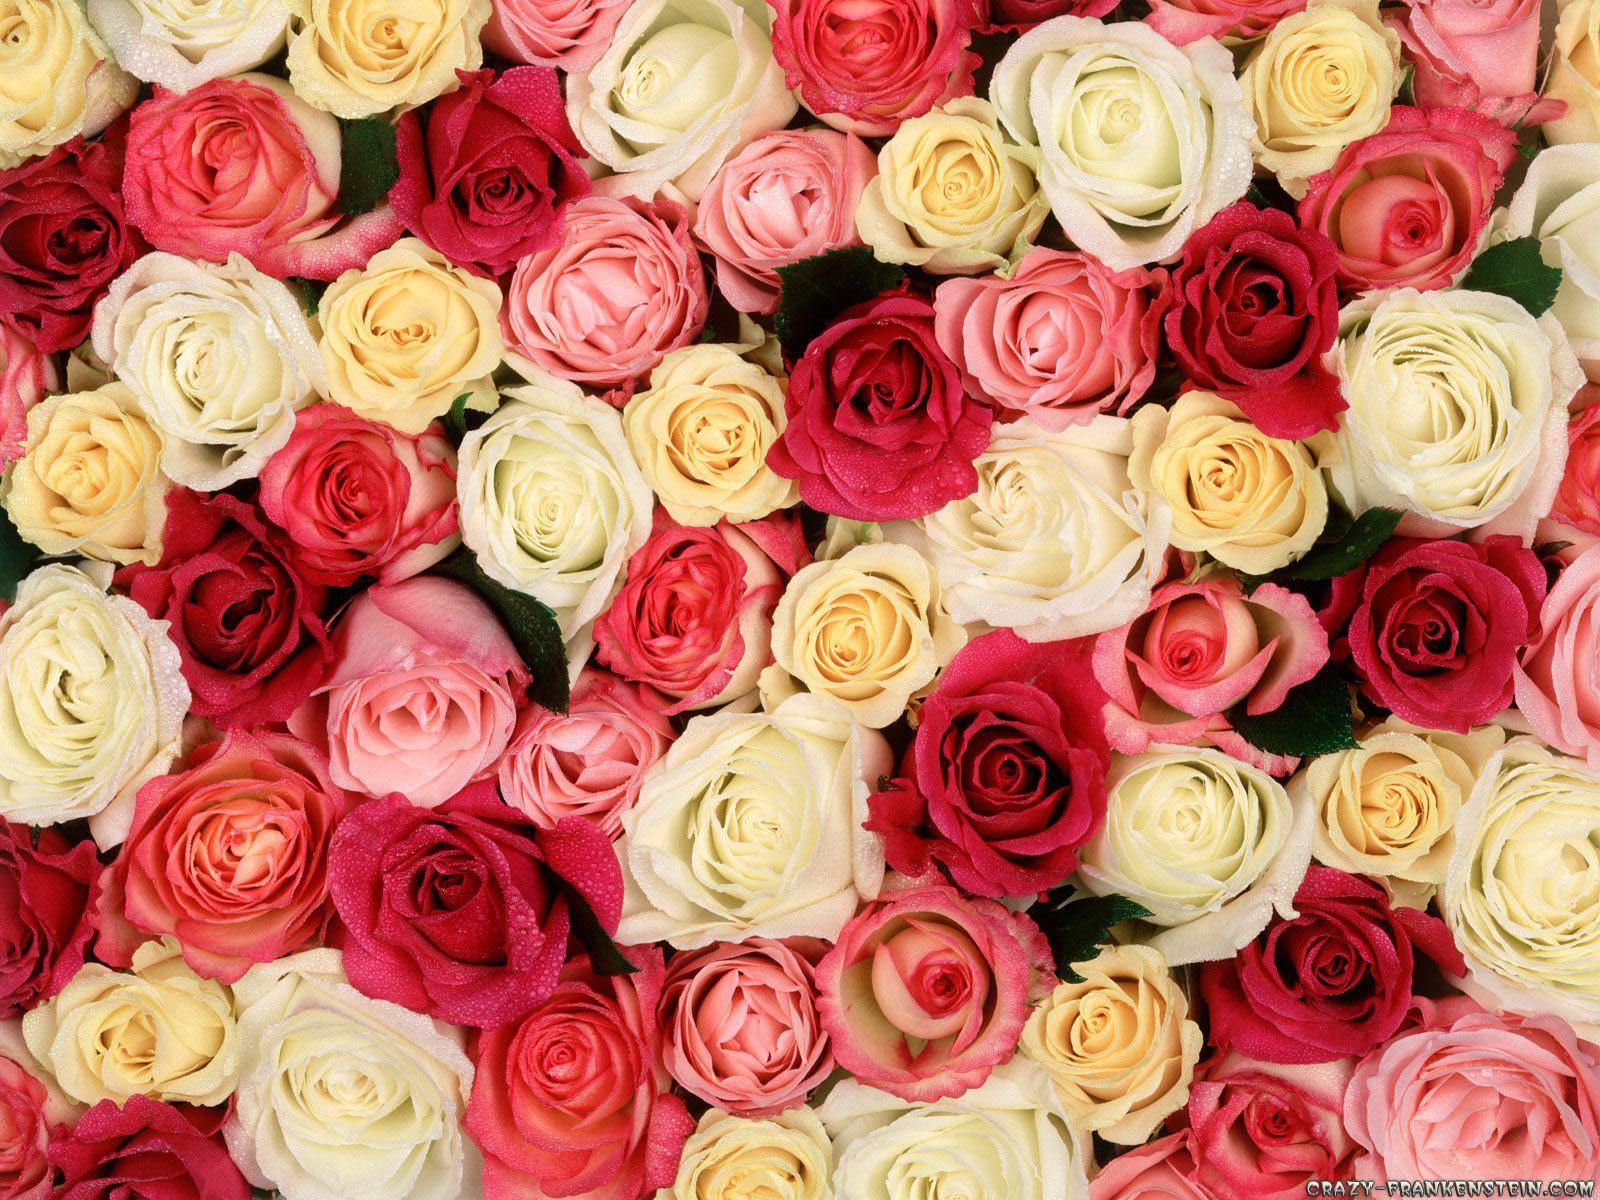 Red Roses Tumblr Vintage